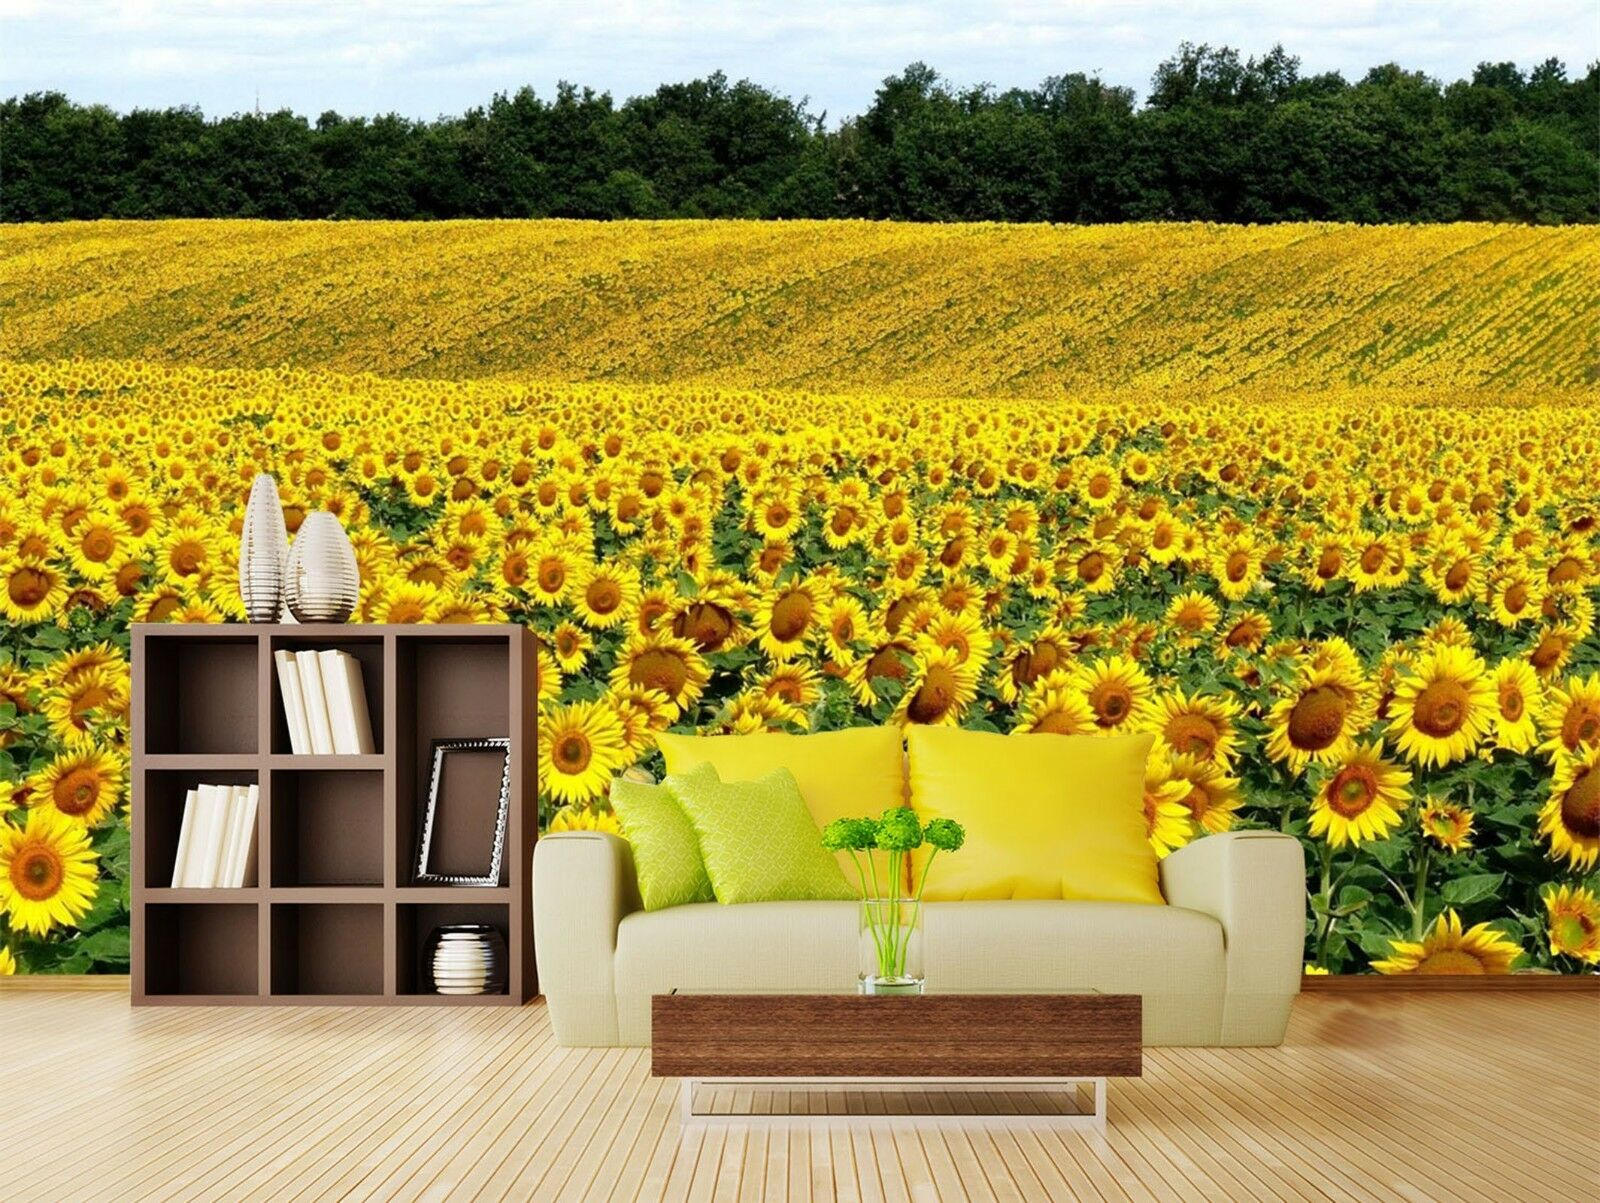 3D SonnenBlaume Feld Himmel 8049 Tapete Wandgemälde Tapeten Bild Familie Familie Familie DE Lemon | Neuartiges Design  | New Products  |  22d629